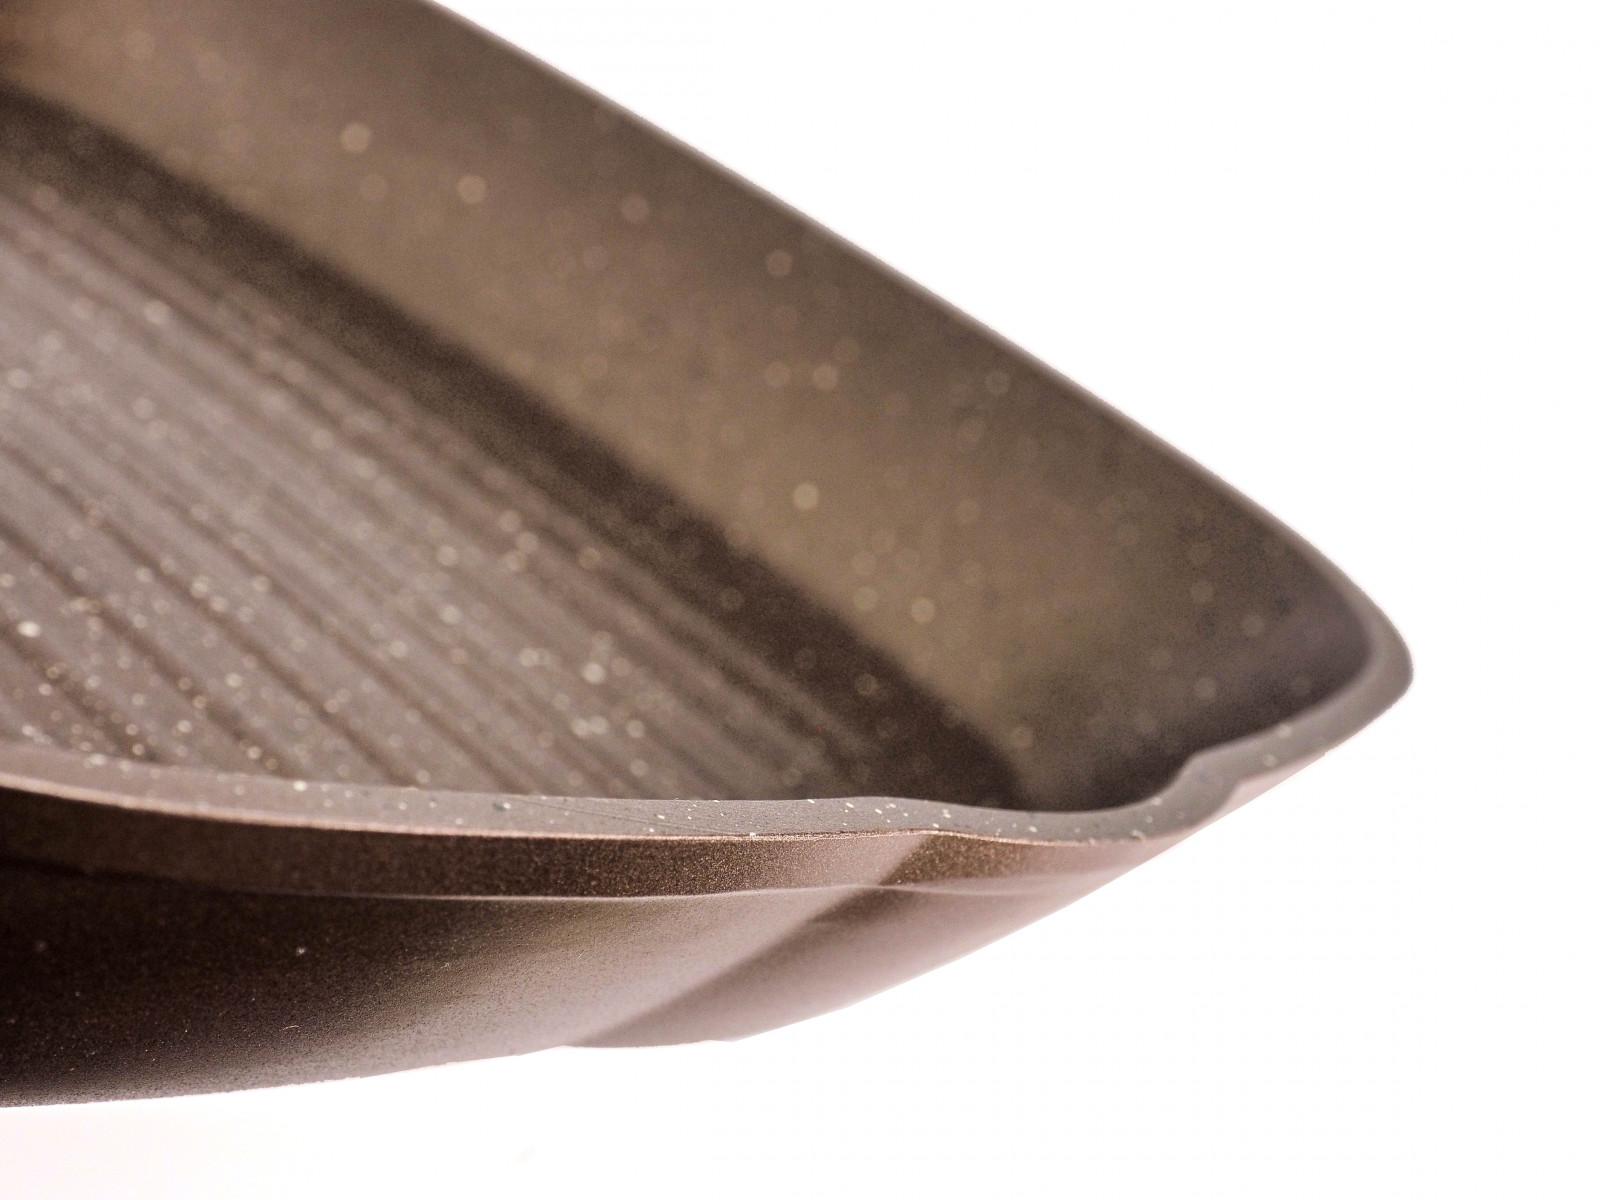 Сковородка-гриль Lessner Chocolate Line 28 см 88365